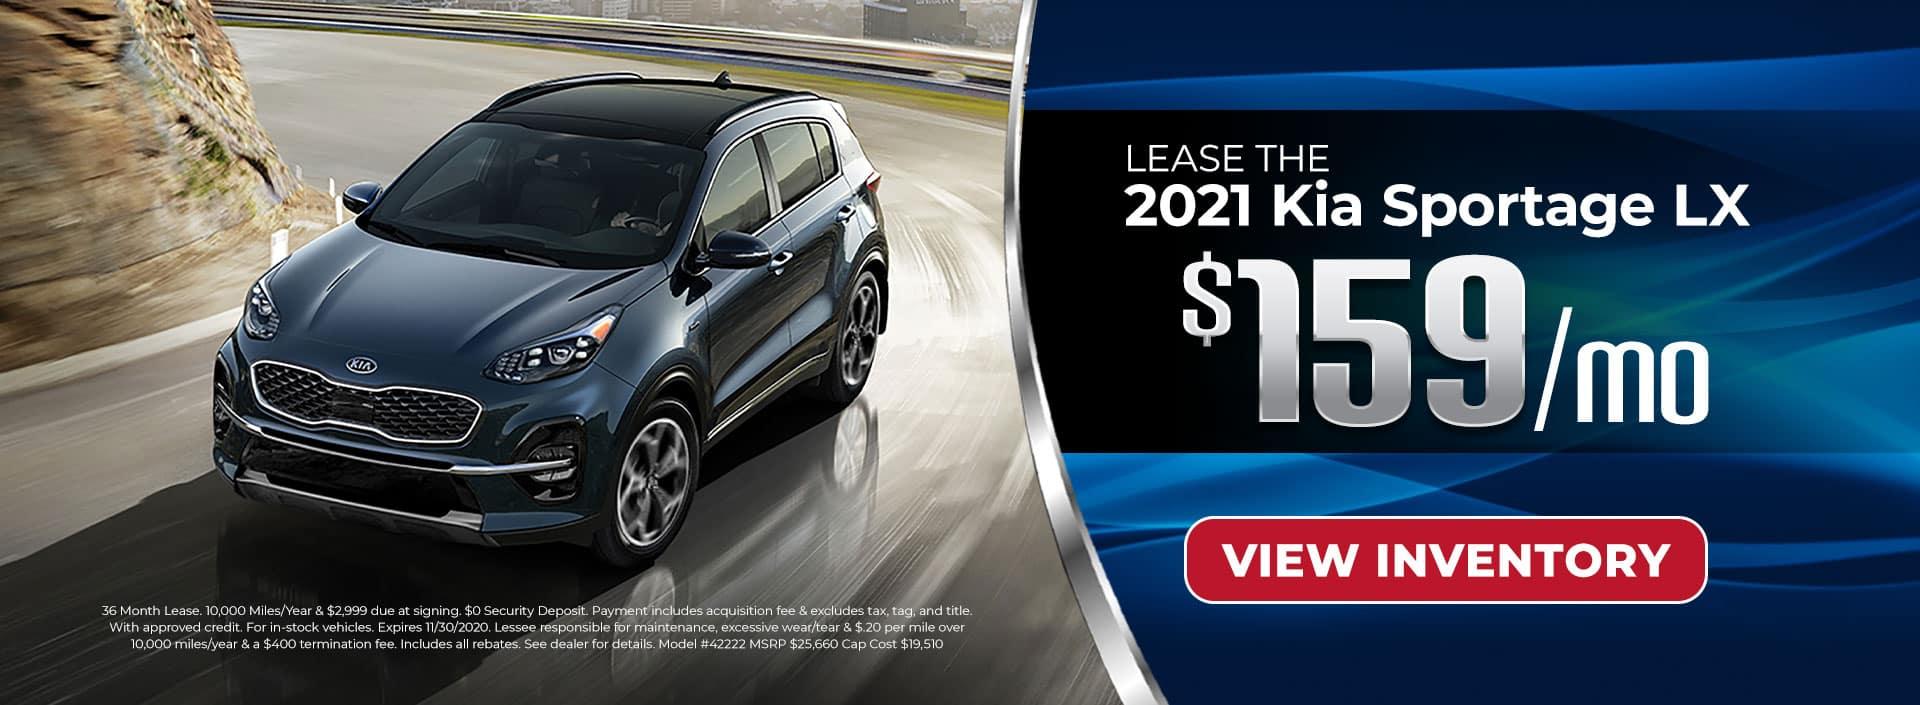 Lease 2021 Sportage for $159/mo in Atlanta, GA